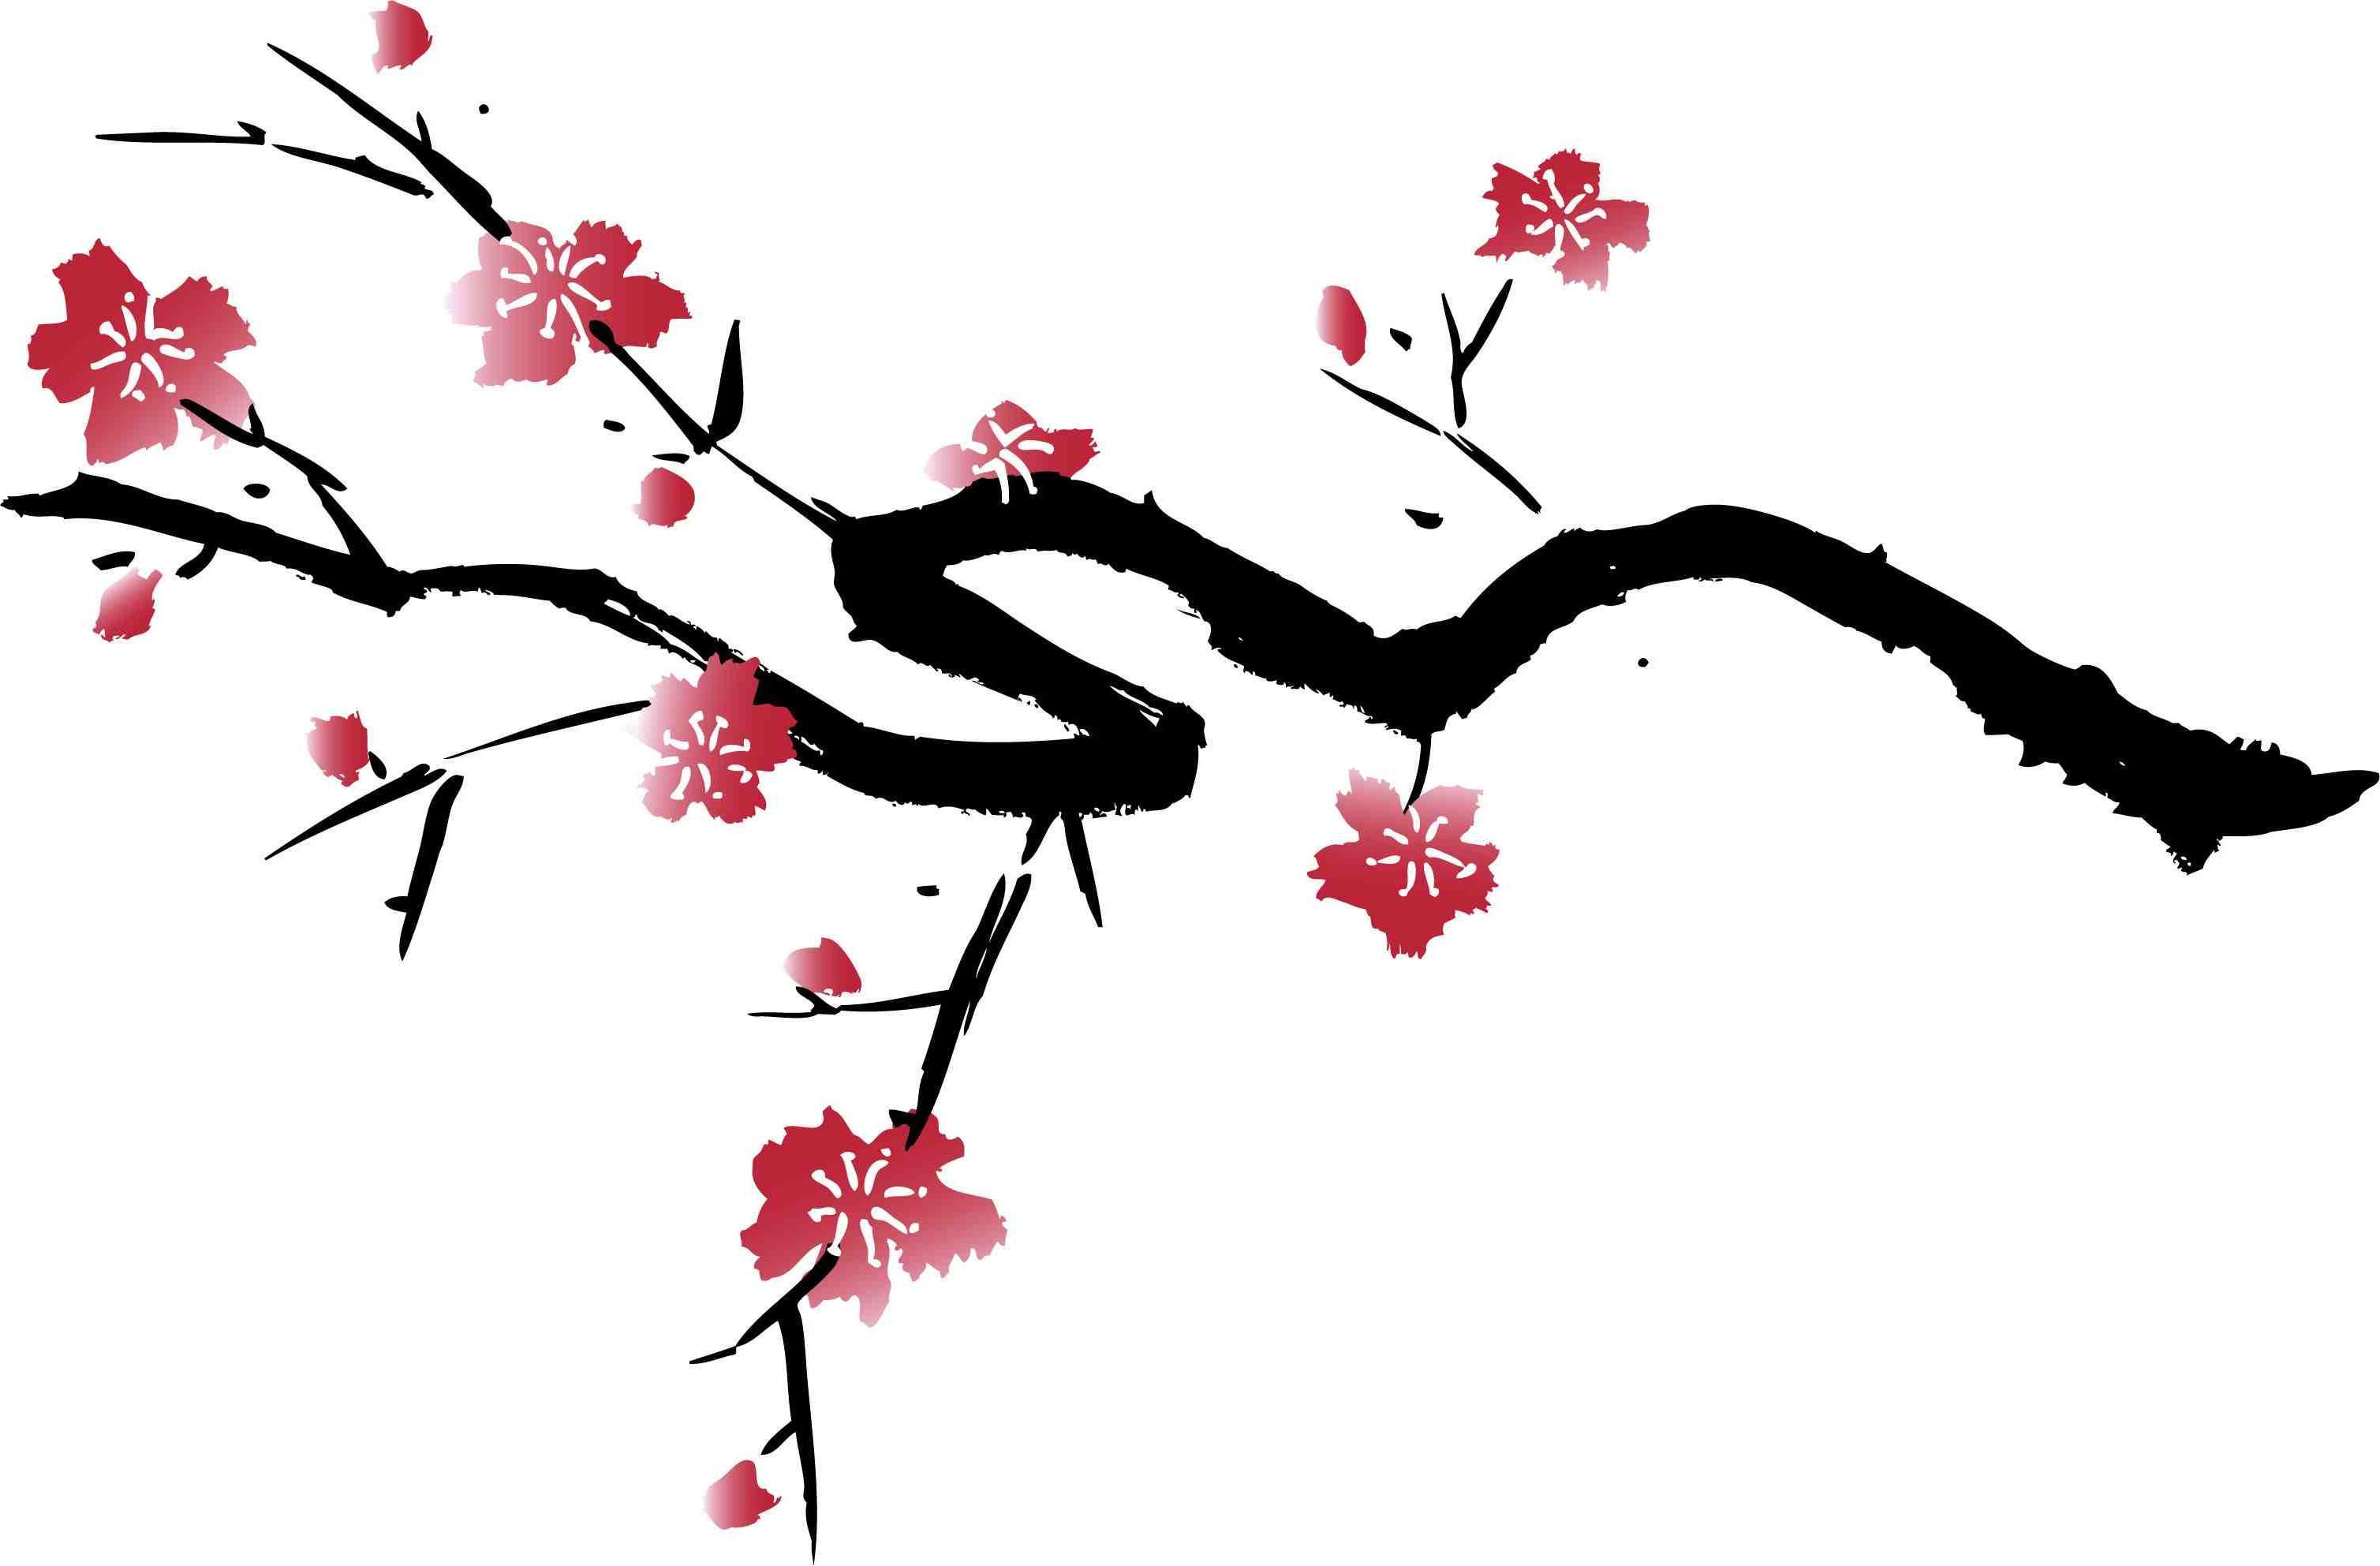 3017x1985 Cherry Blossom Tree Silhouette